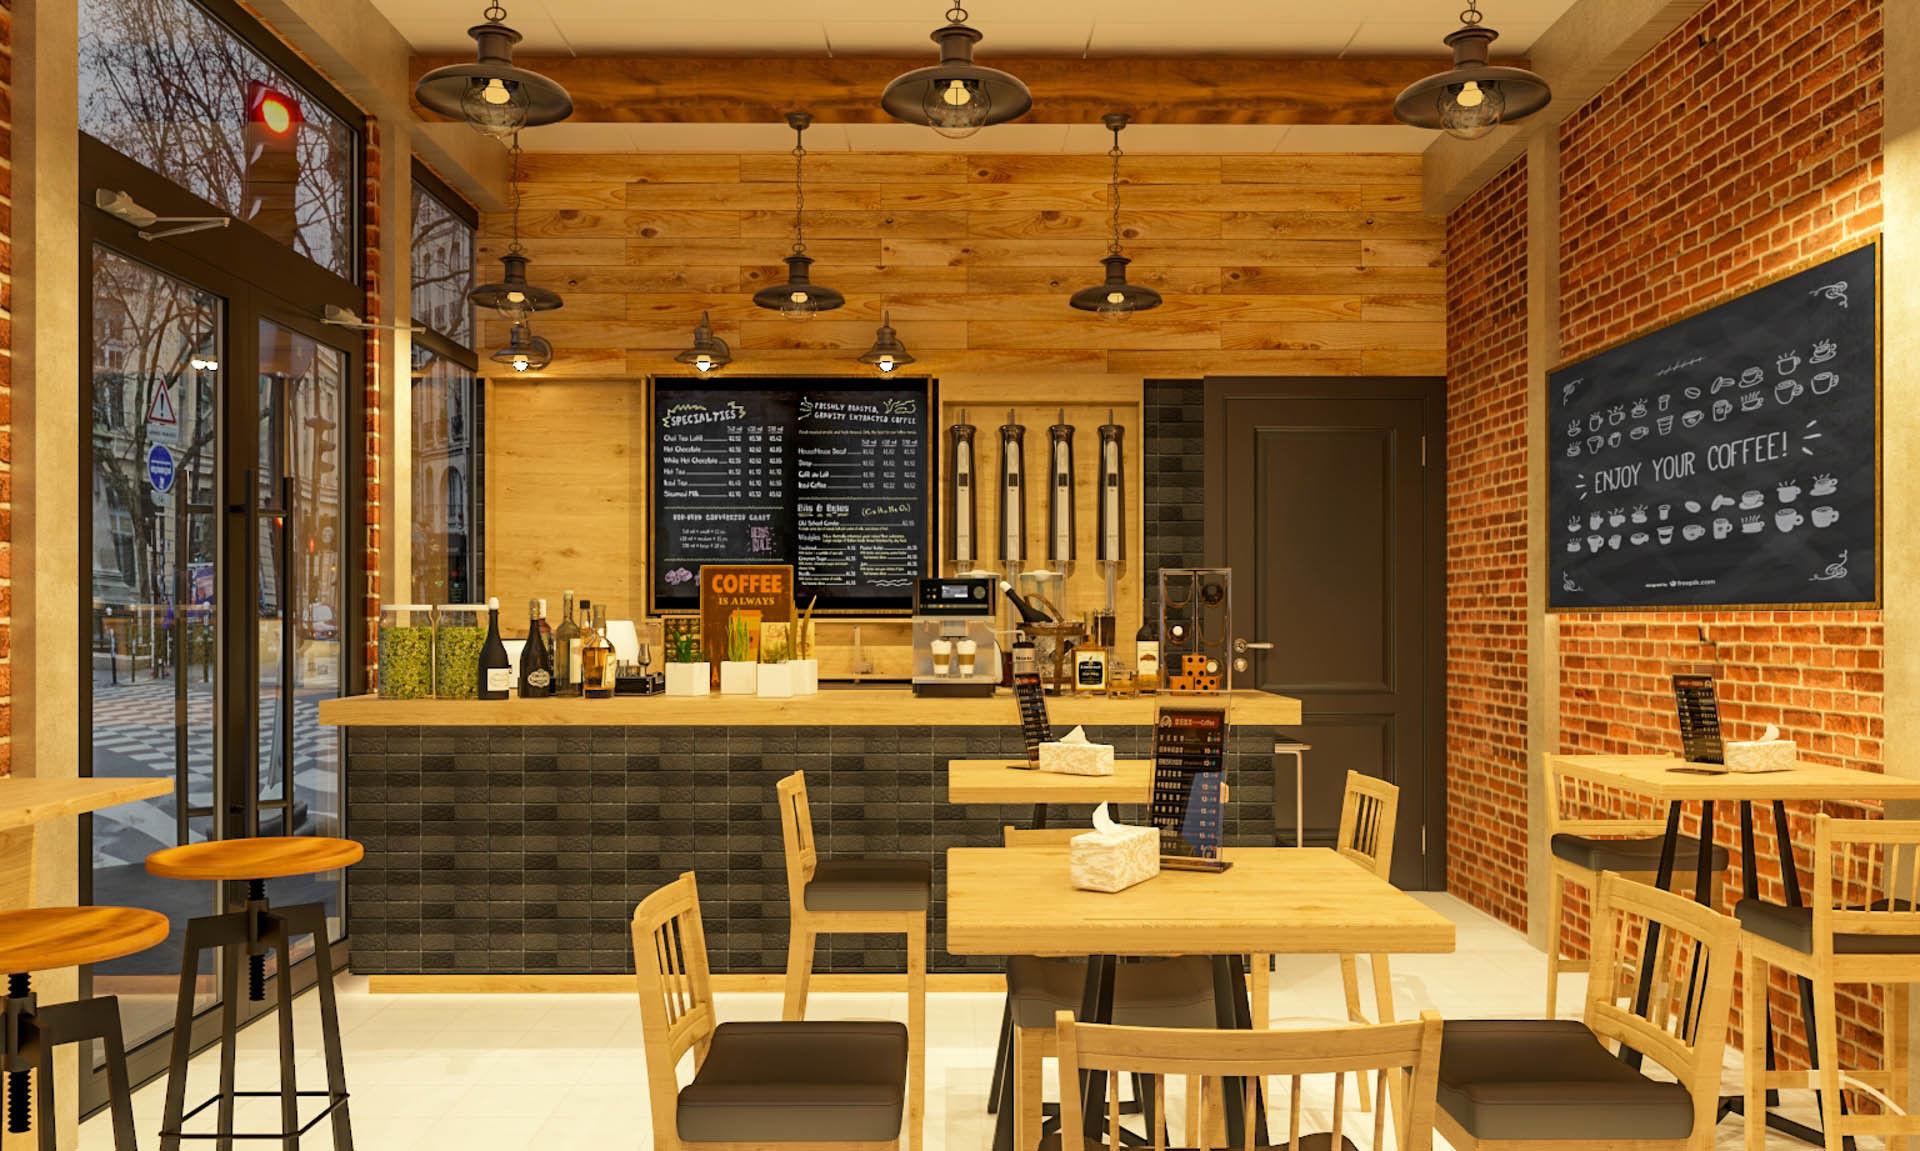 Daftar Kursi cafe Kayu Minimalis Terbaru